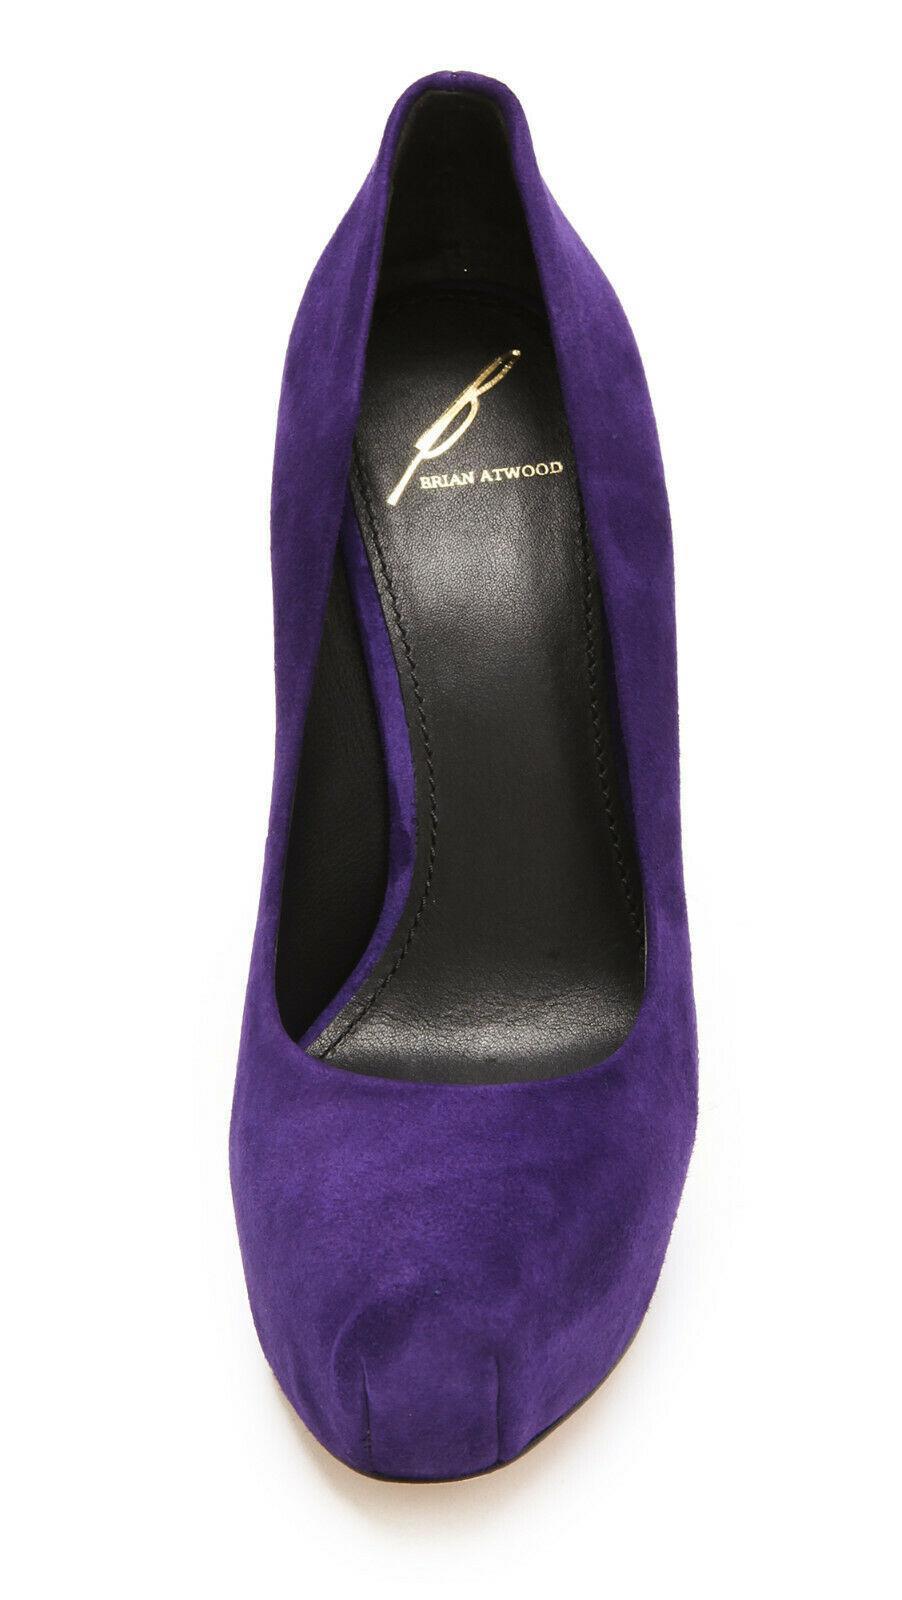 Brian Atwood Savita Platform Pumps Suede Purple, Size 8 M image 3